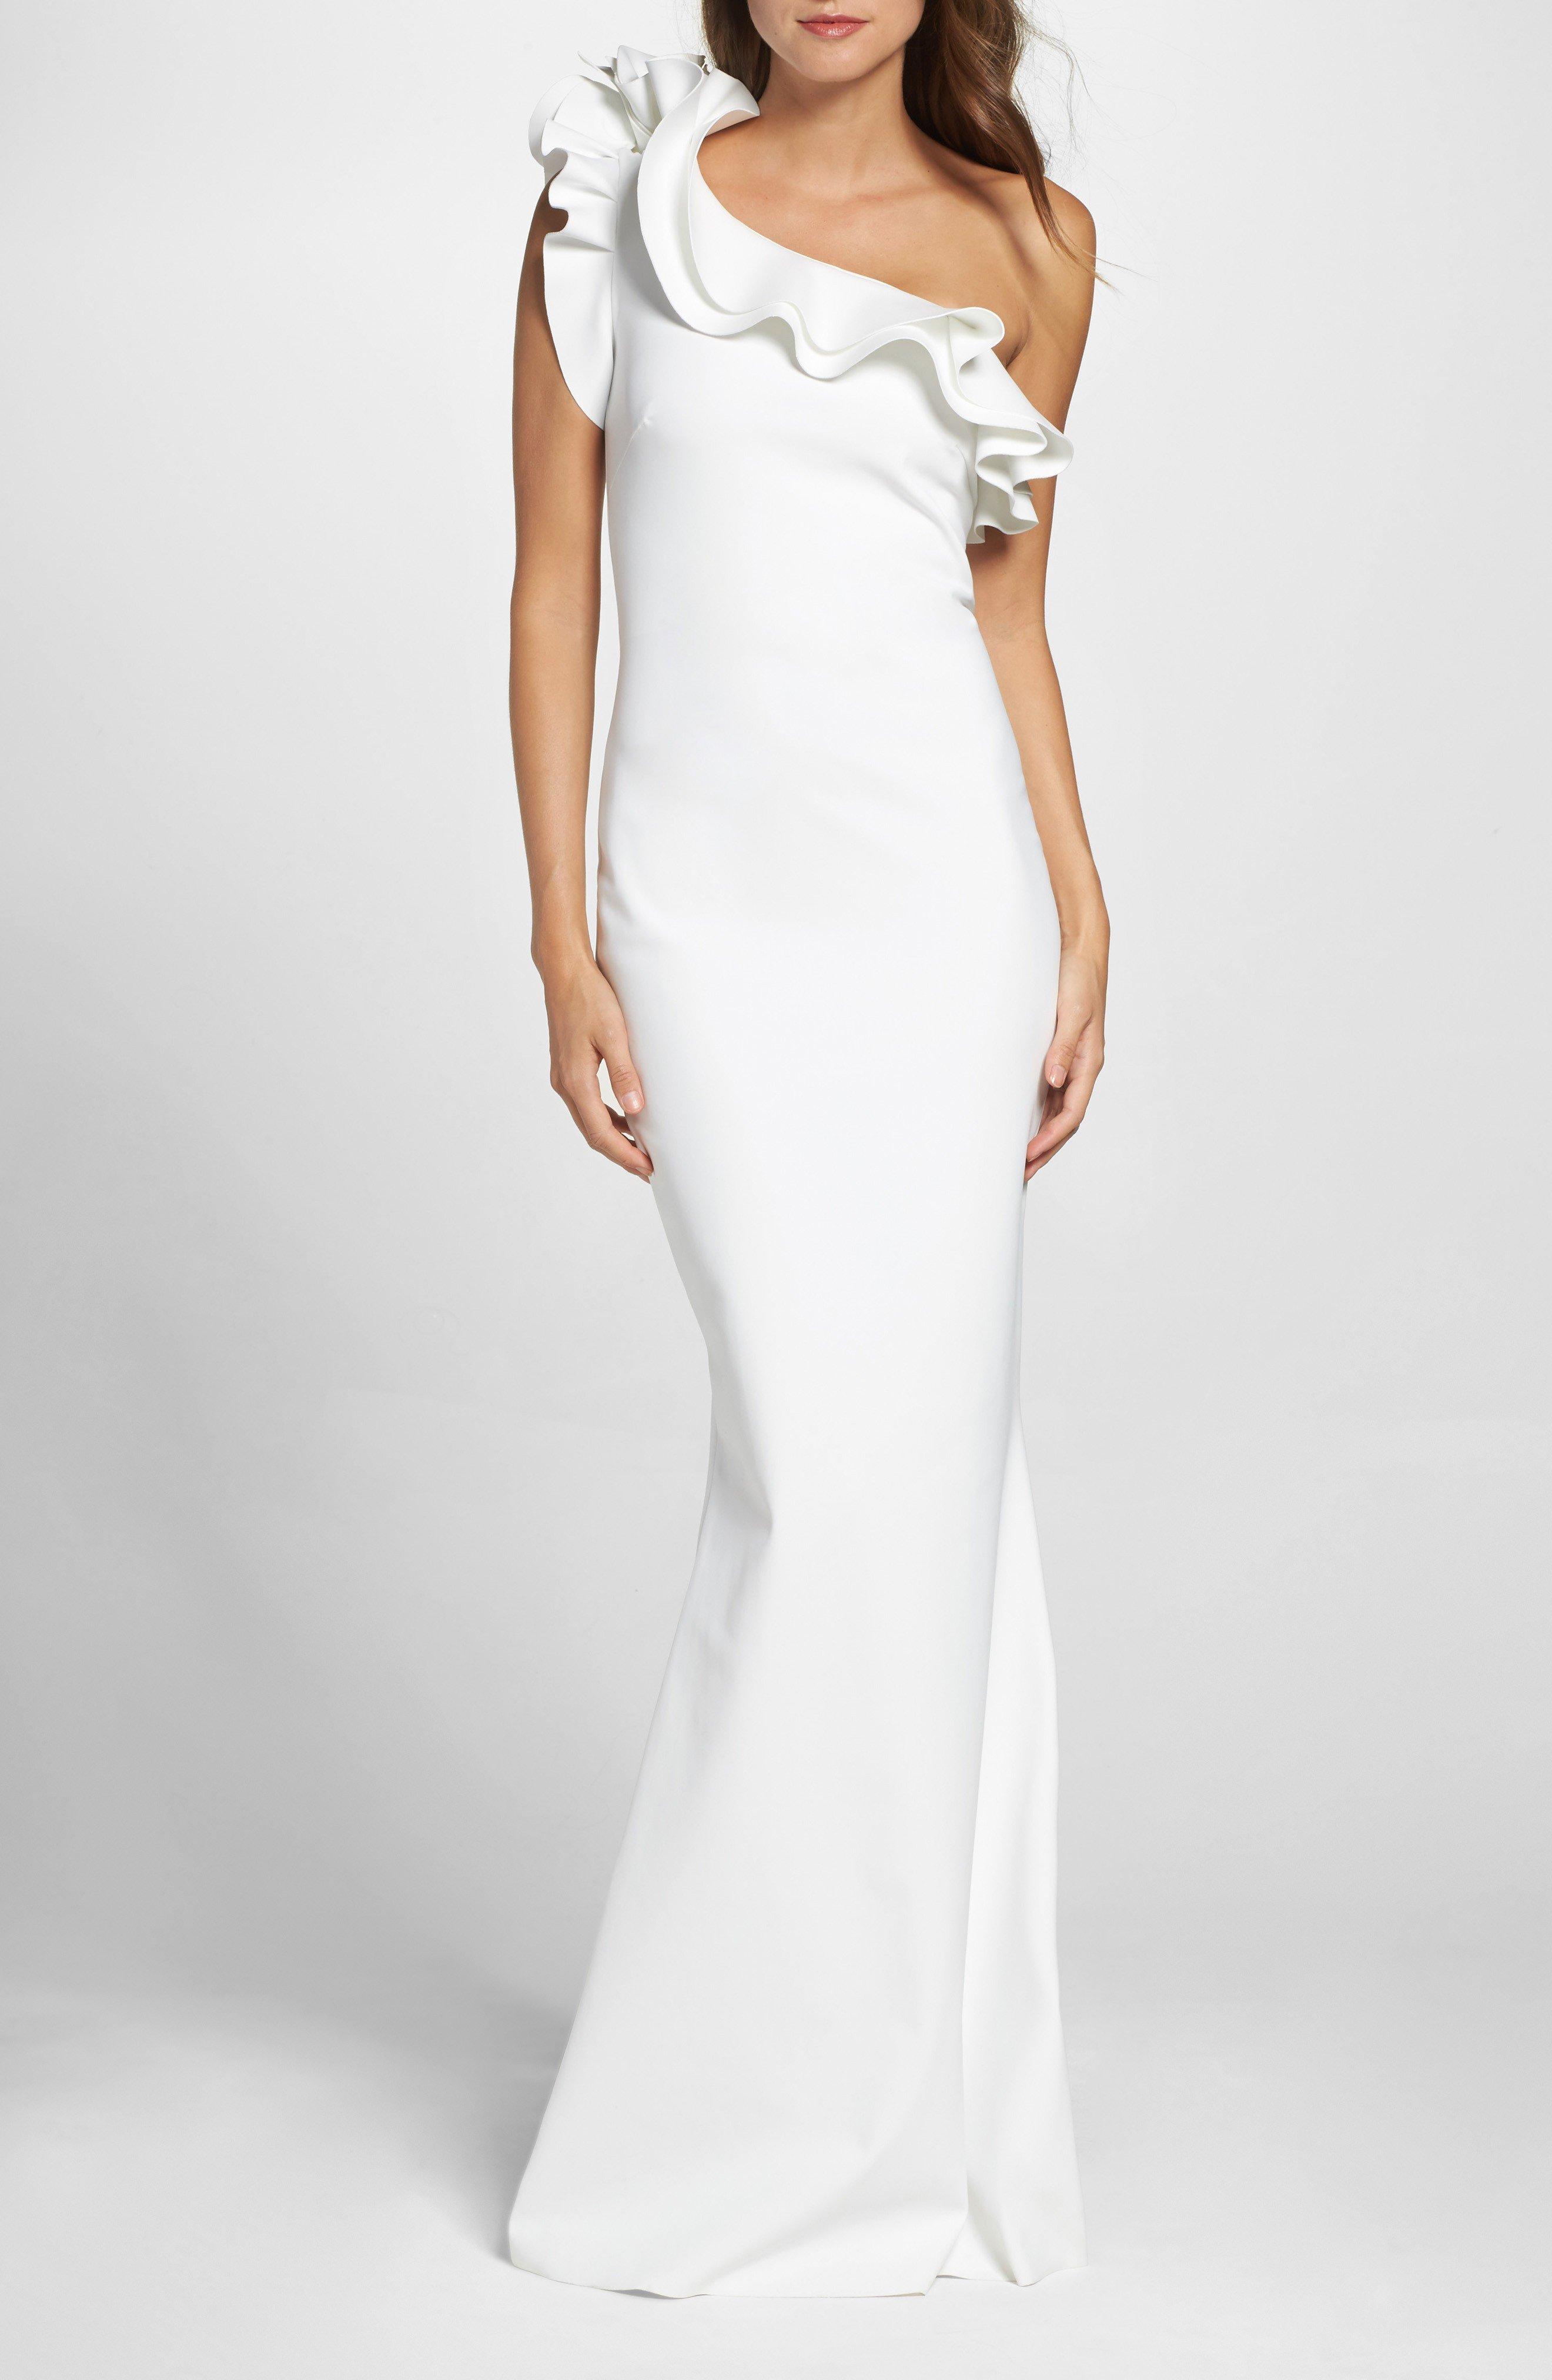 CHIARA BONI LA PETITE ROBE Elisir Ruffle One-Shoulder White Gown